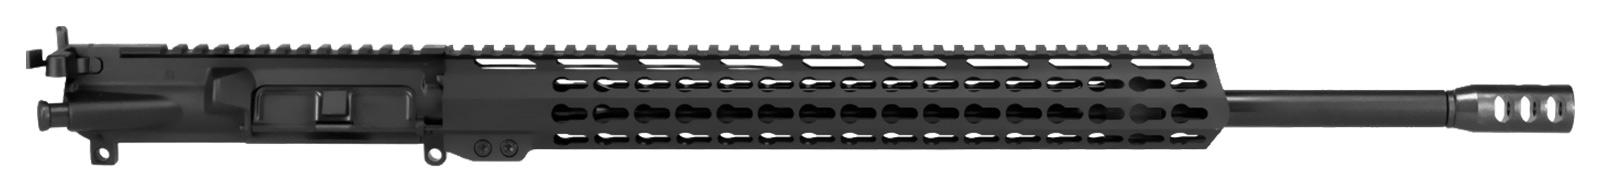 ar-15-upper-assembly-20-224-valkyrie-nitride-17-15-keymod-160896-1